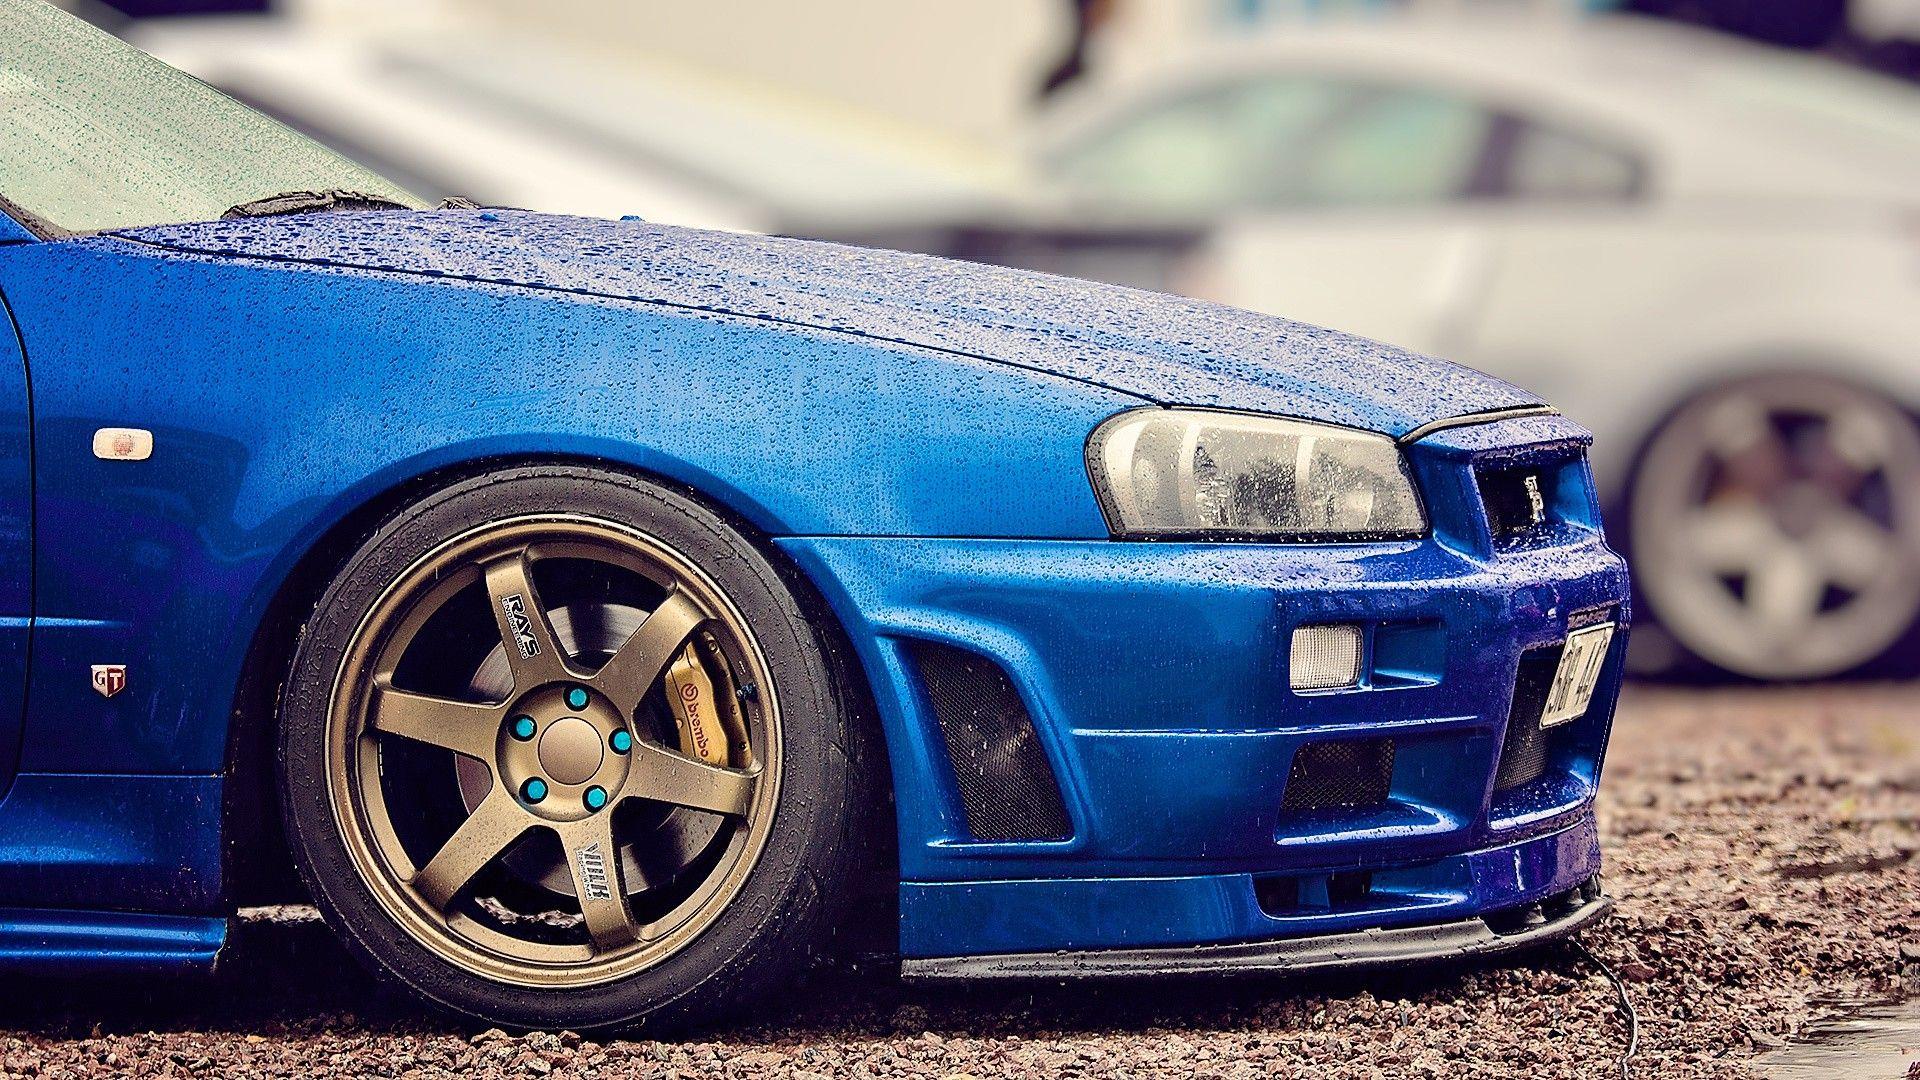 nissan skyline hd wallpapers 1080p cars   sgtr   pinterest   cars